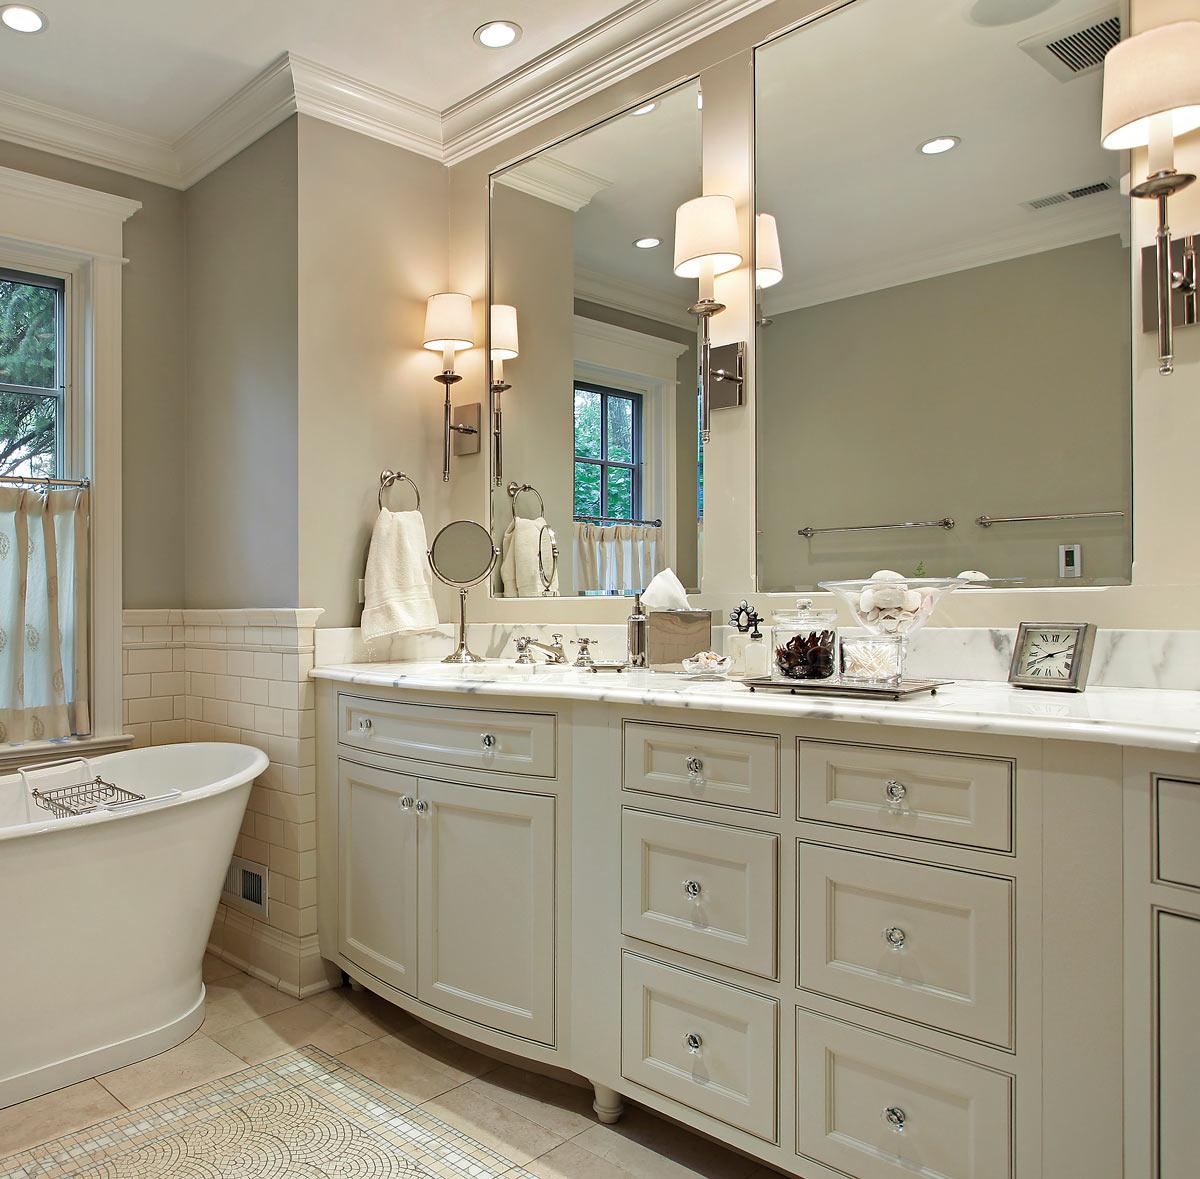 Bathroom remodeling, vanities, soaker tub, and custom cabinets in Concord, NC